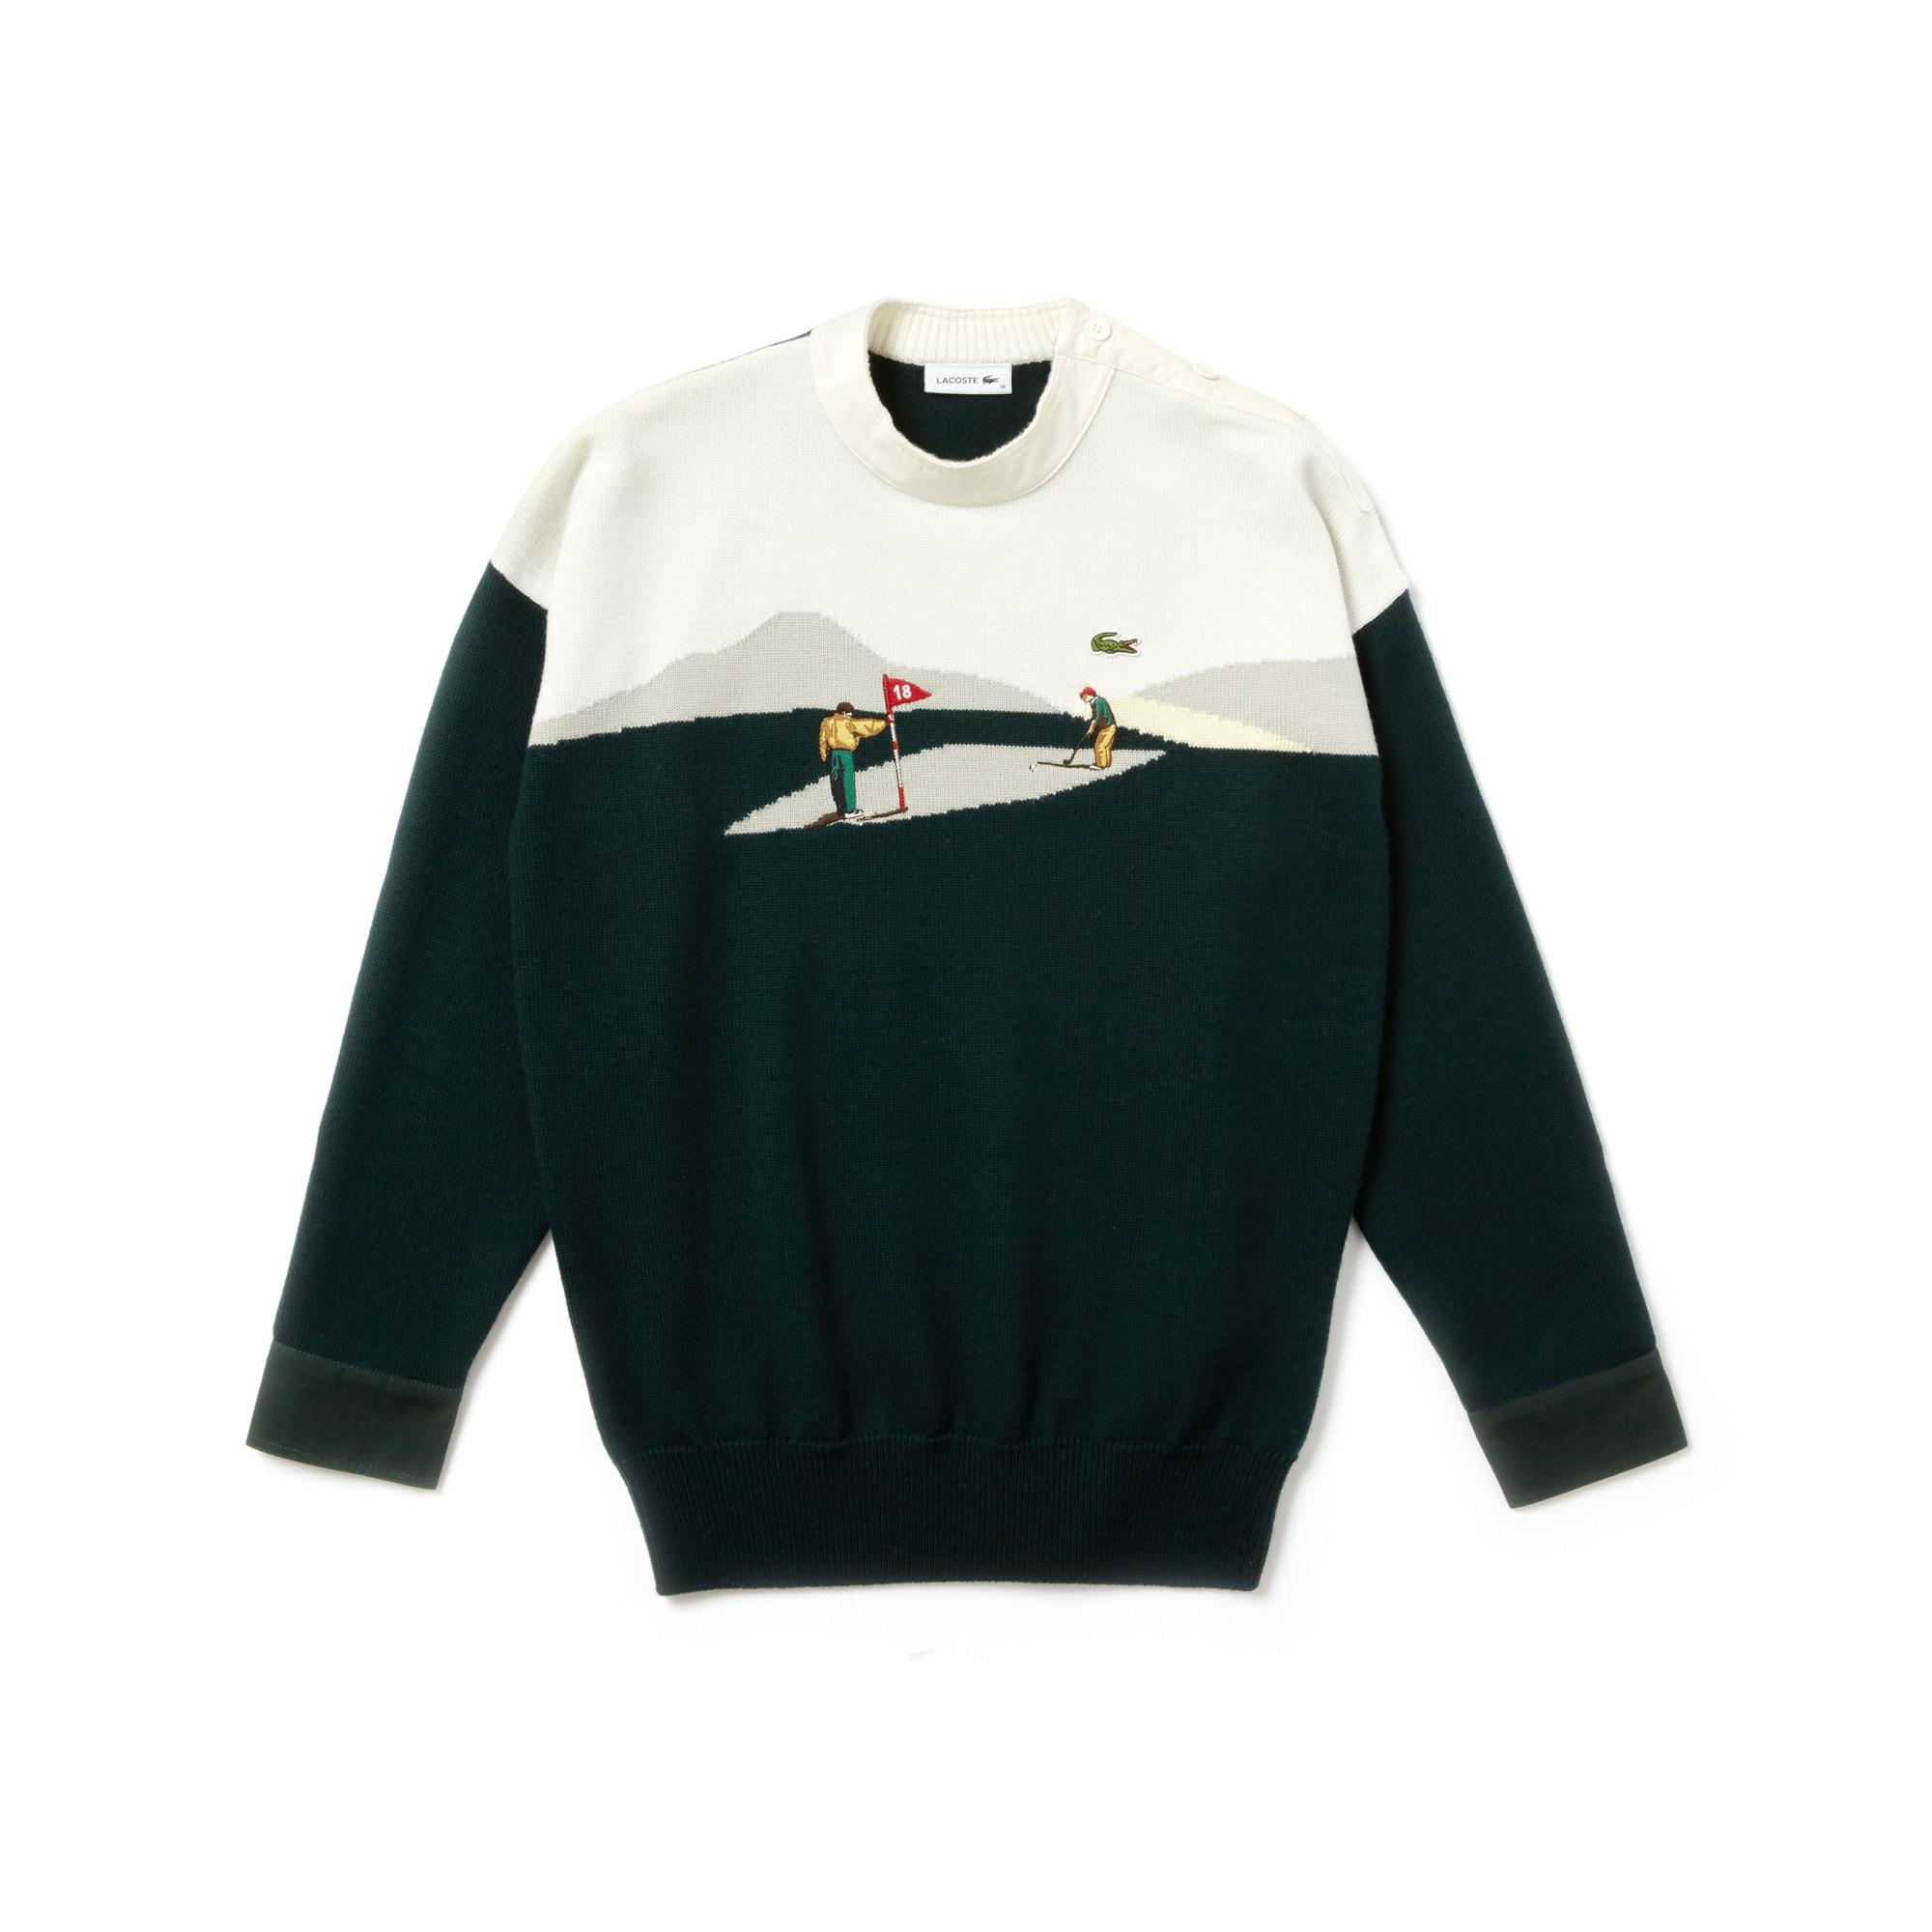 Gestickter Damen Sweater aus Wollstrick FASHION SHOW